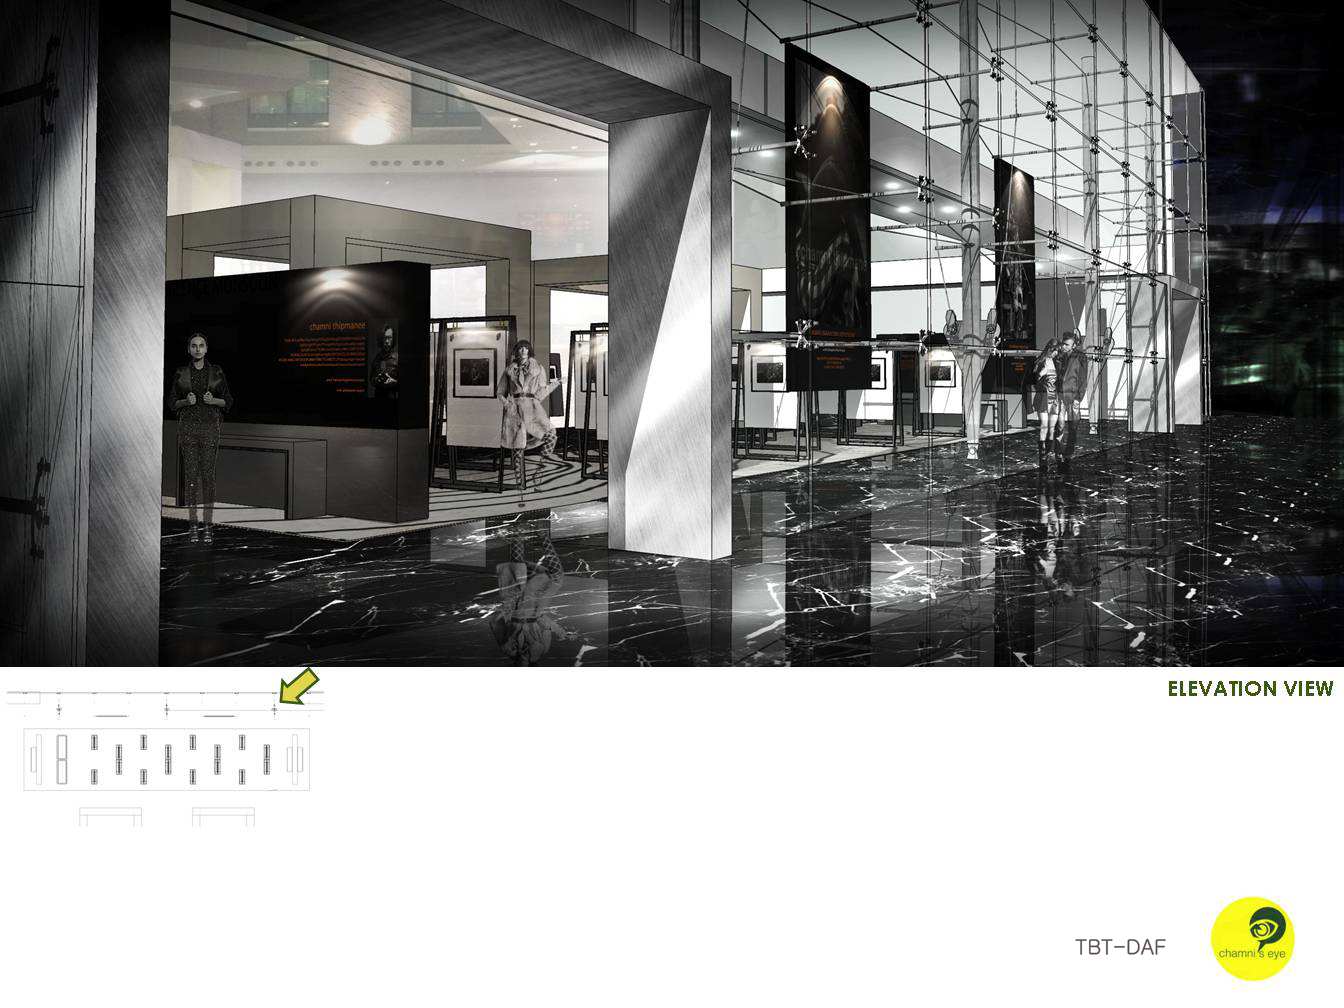 TBT-DAF interior design monsoon exhibition bw photo 18